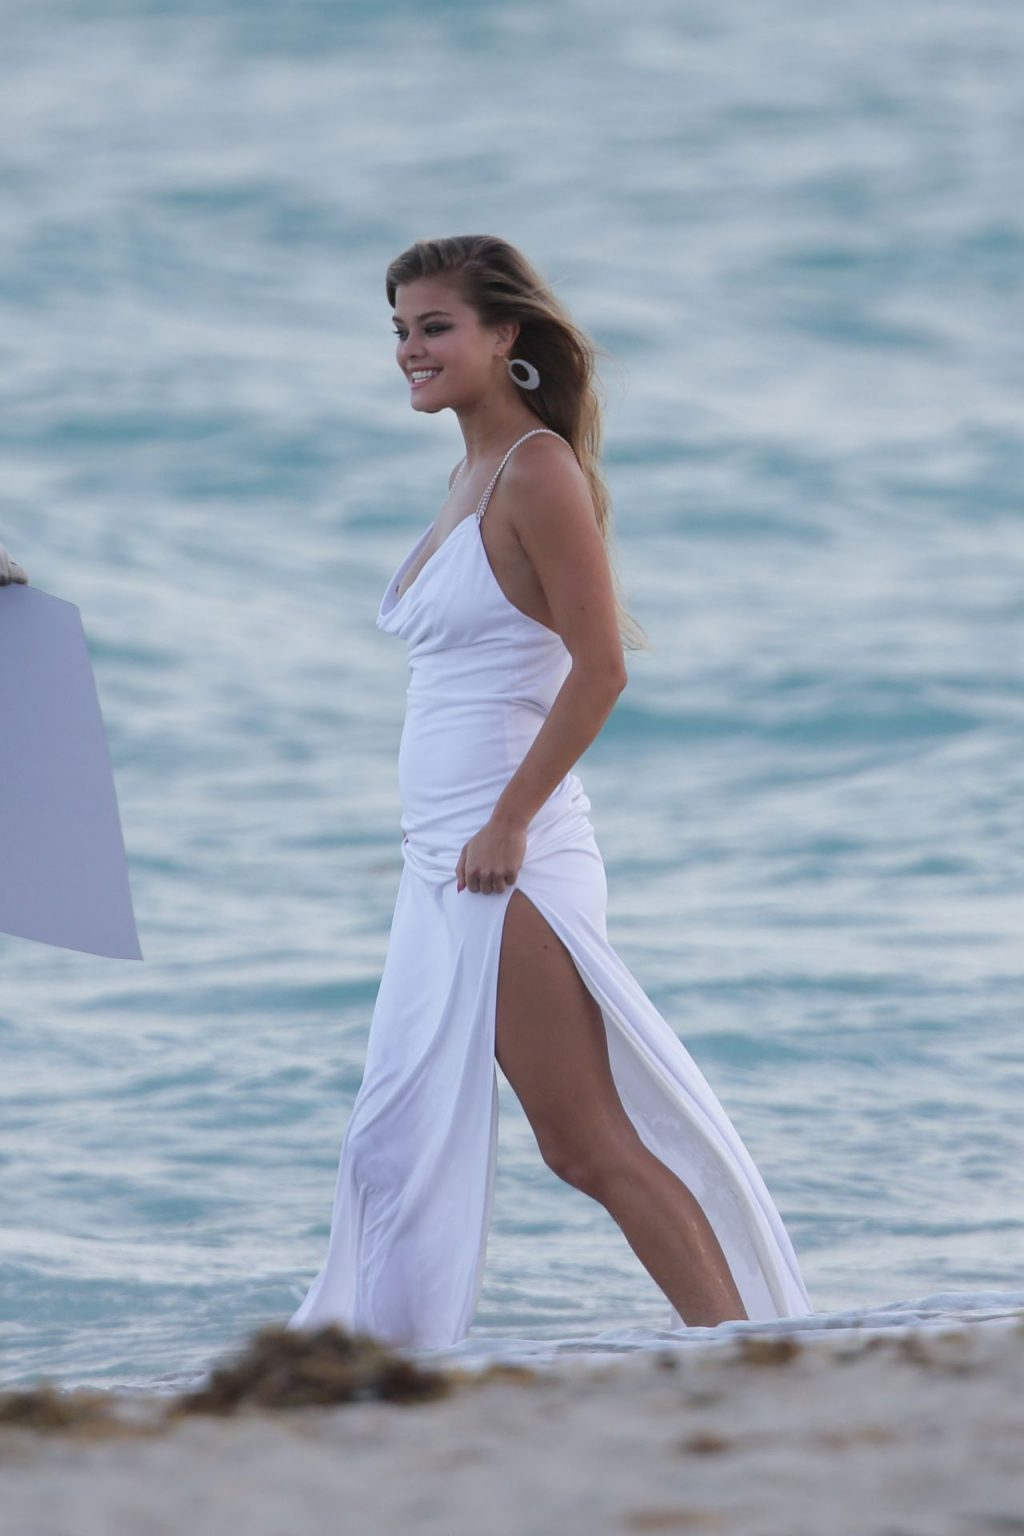 Nina Agdal Has a Couple Wardrobe Malfunctions While Navigating The Surf For a Photoshoot (25 Photos)